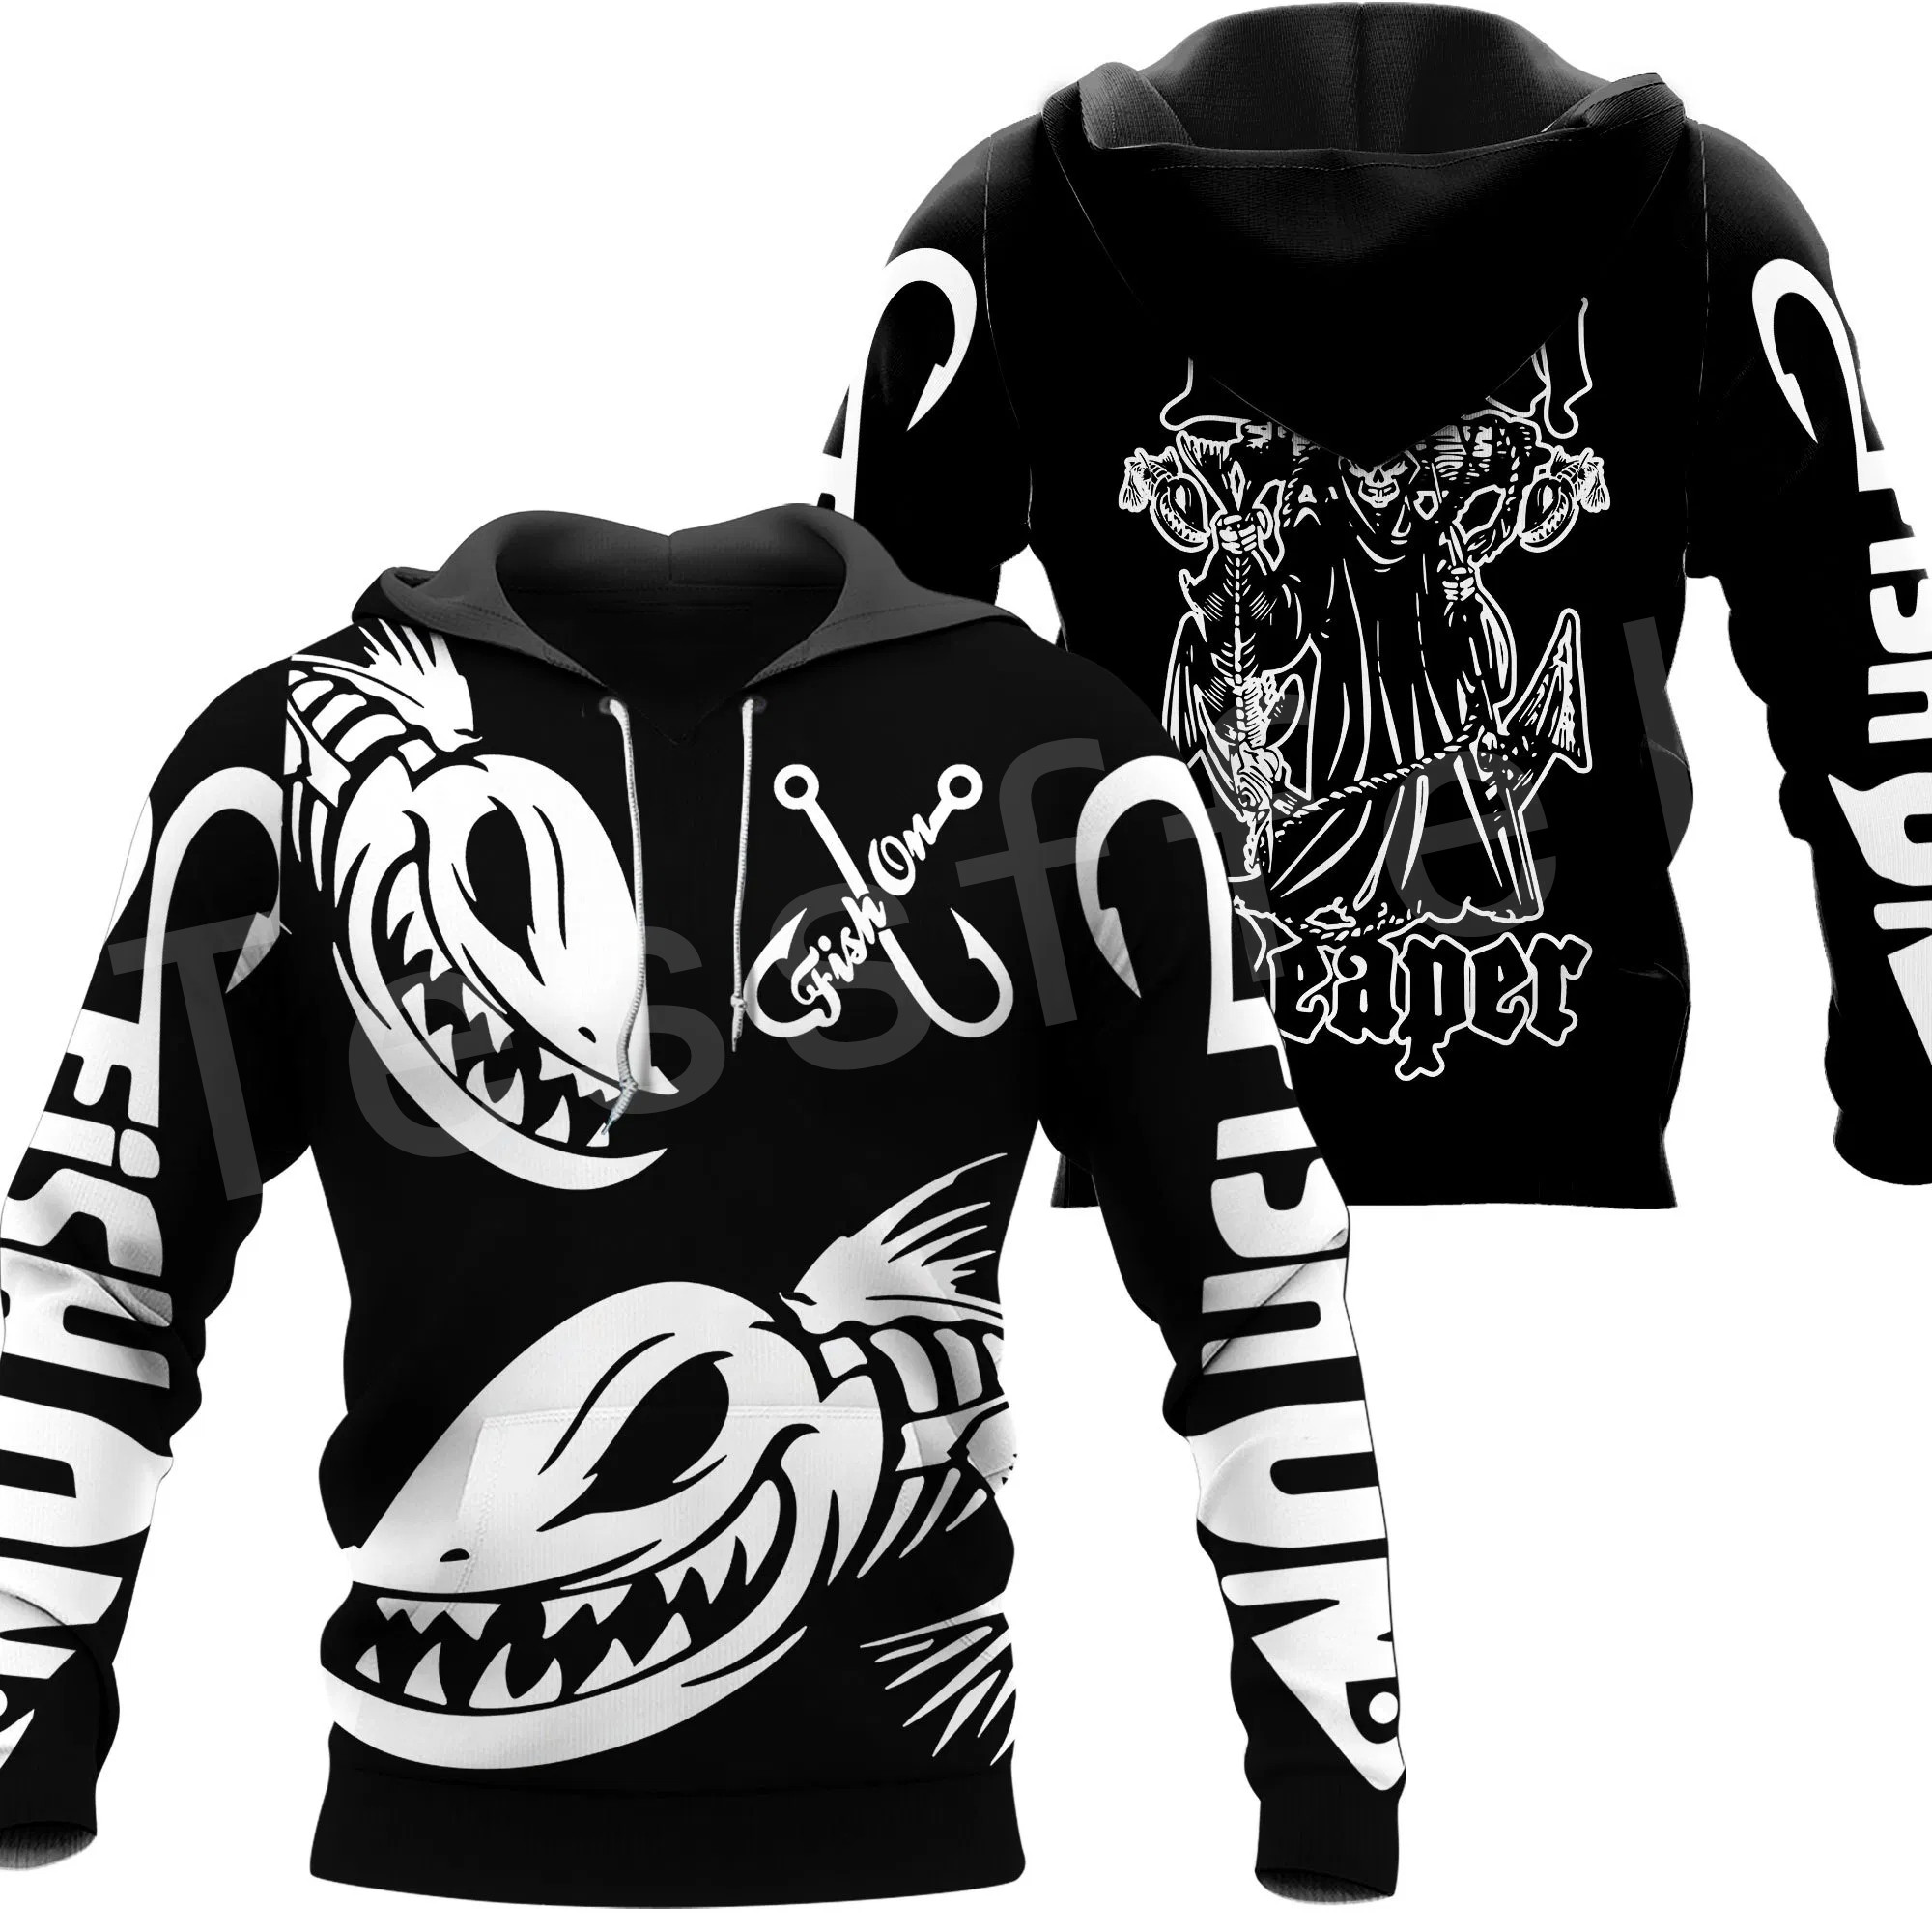 Tessffel New Fashion Animal Camo Bass Fishing Fisher Tracksuit Harajuku Unisex 3DPrinted Zipper/Hoodies/Sweatshirts/Jacket s-10